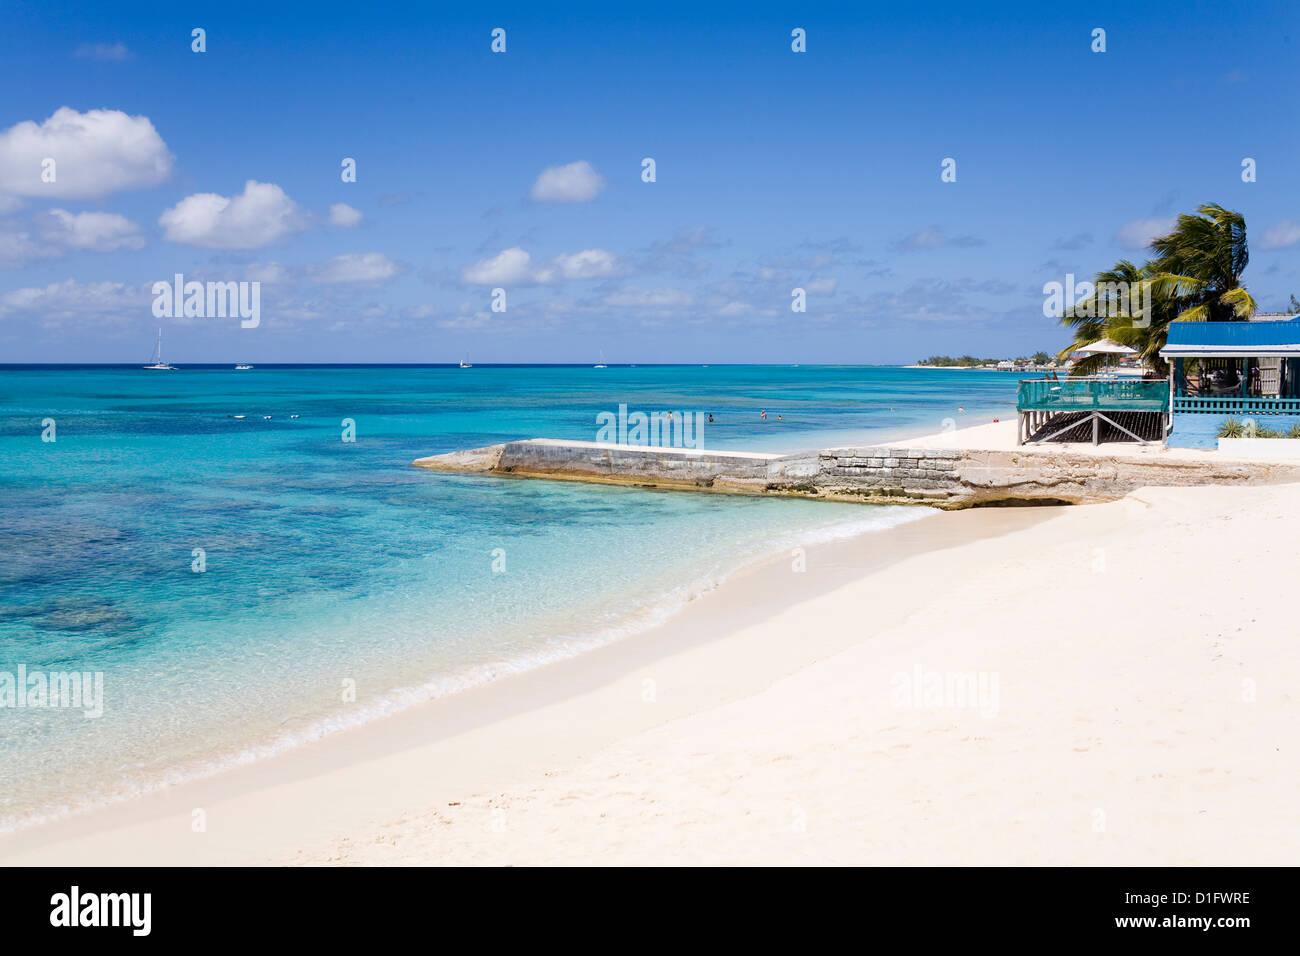 Cedar Grove Beach, Cockburn Town, Grand Turk Island, Turks and Caicos Islands, West Indies, Caribbean, Central America - Stock Image